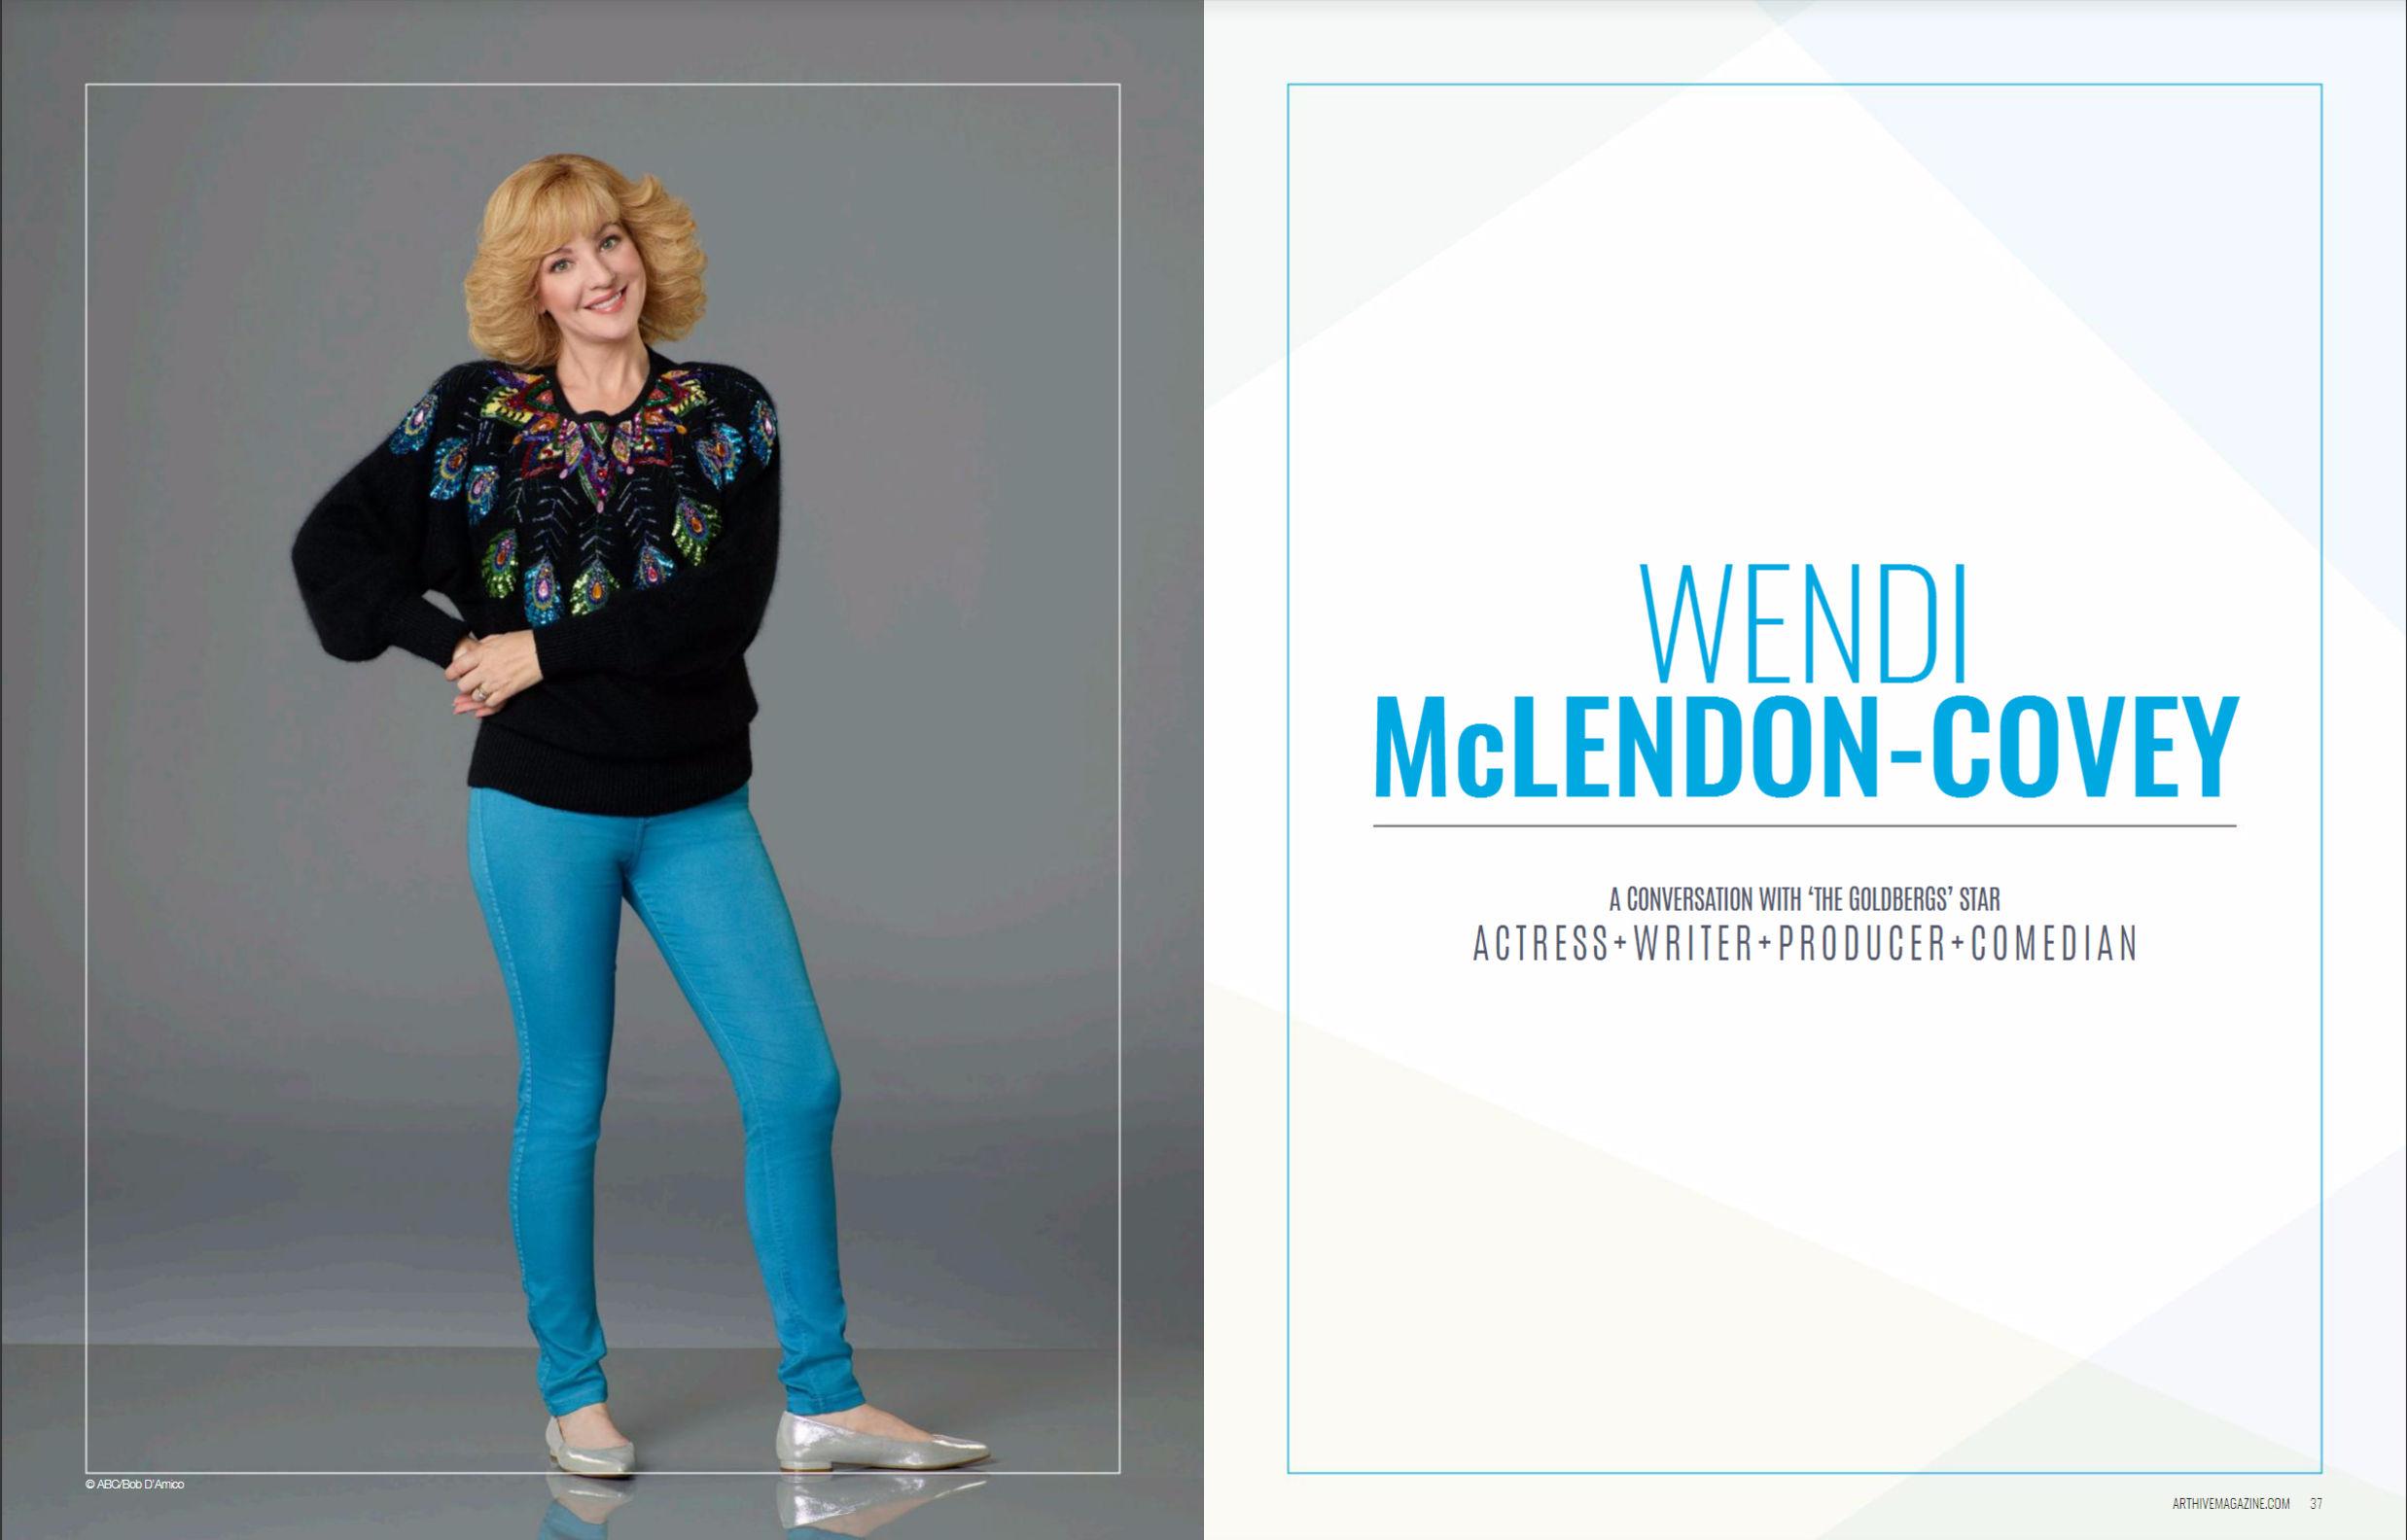 Wendi McLendon-Covey Fansite | Art Hive Magazine